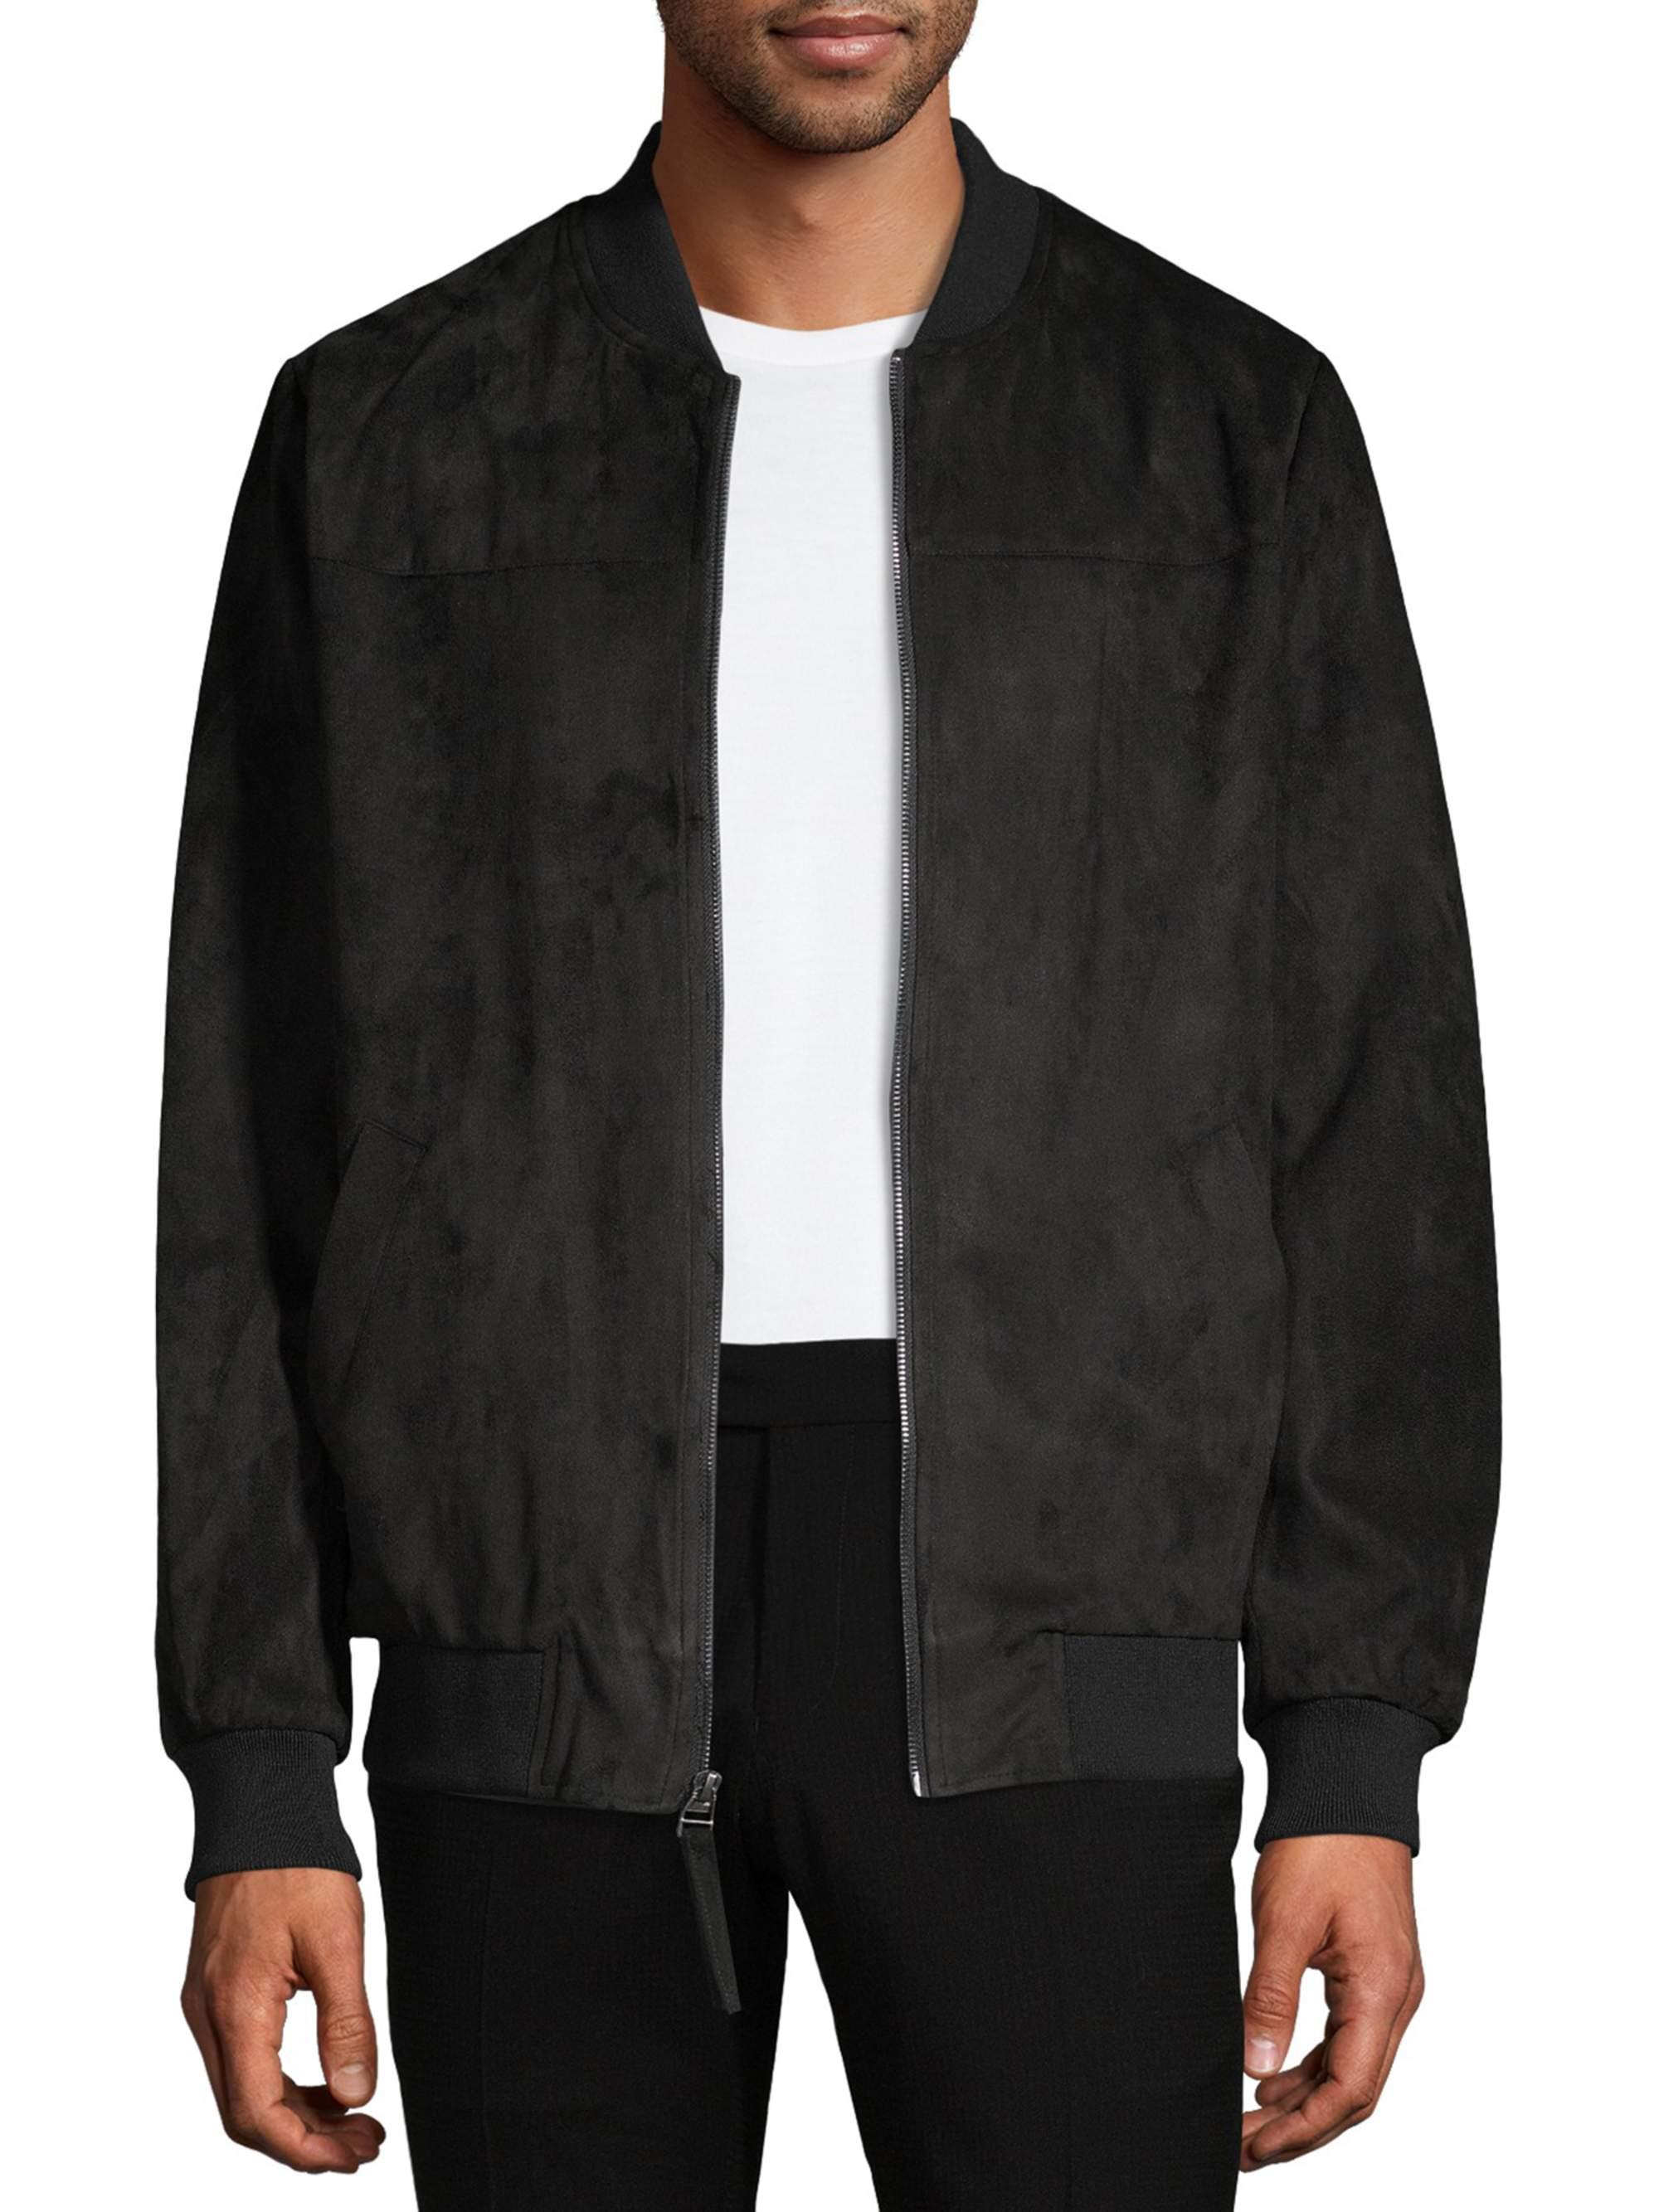 Bagatelle Men's Faux Suede Jackets, up to Size 2XL